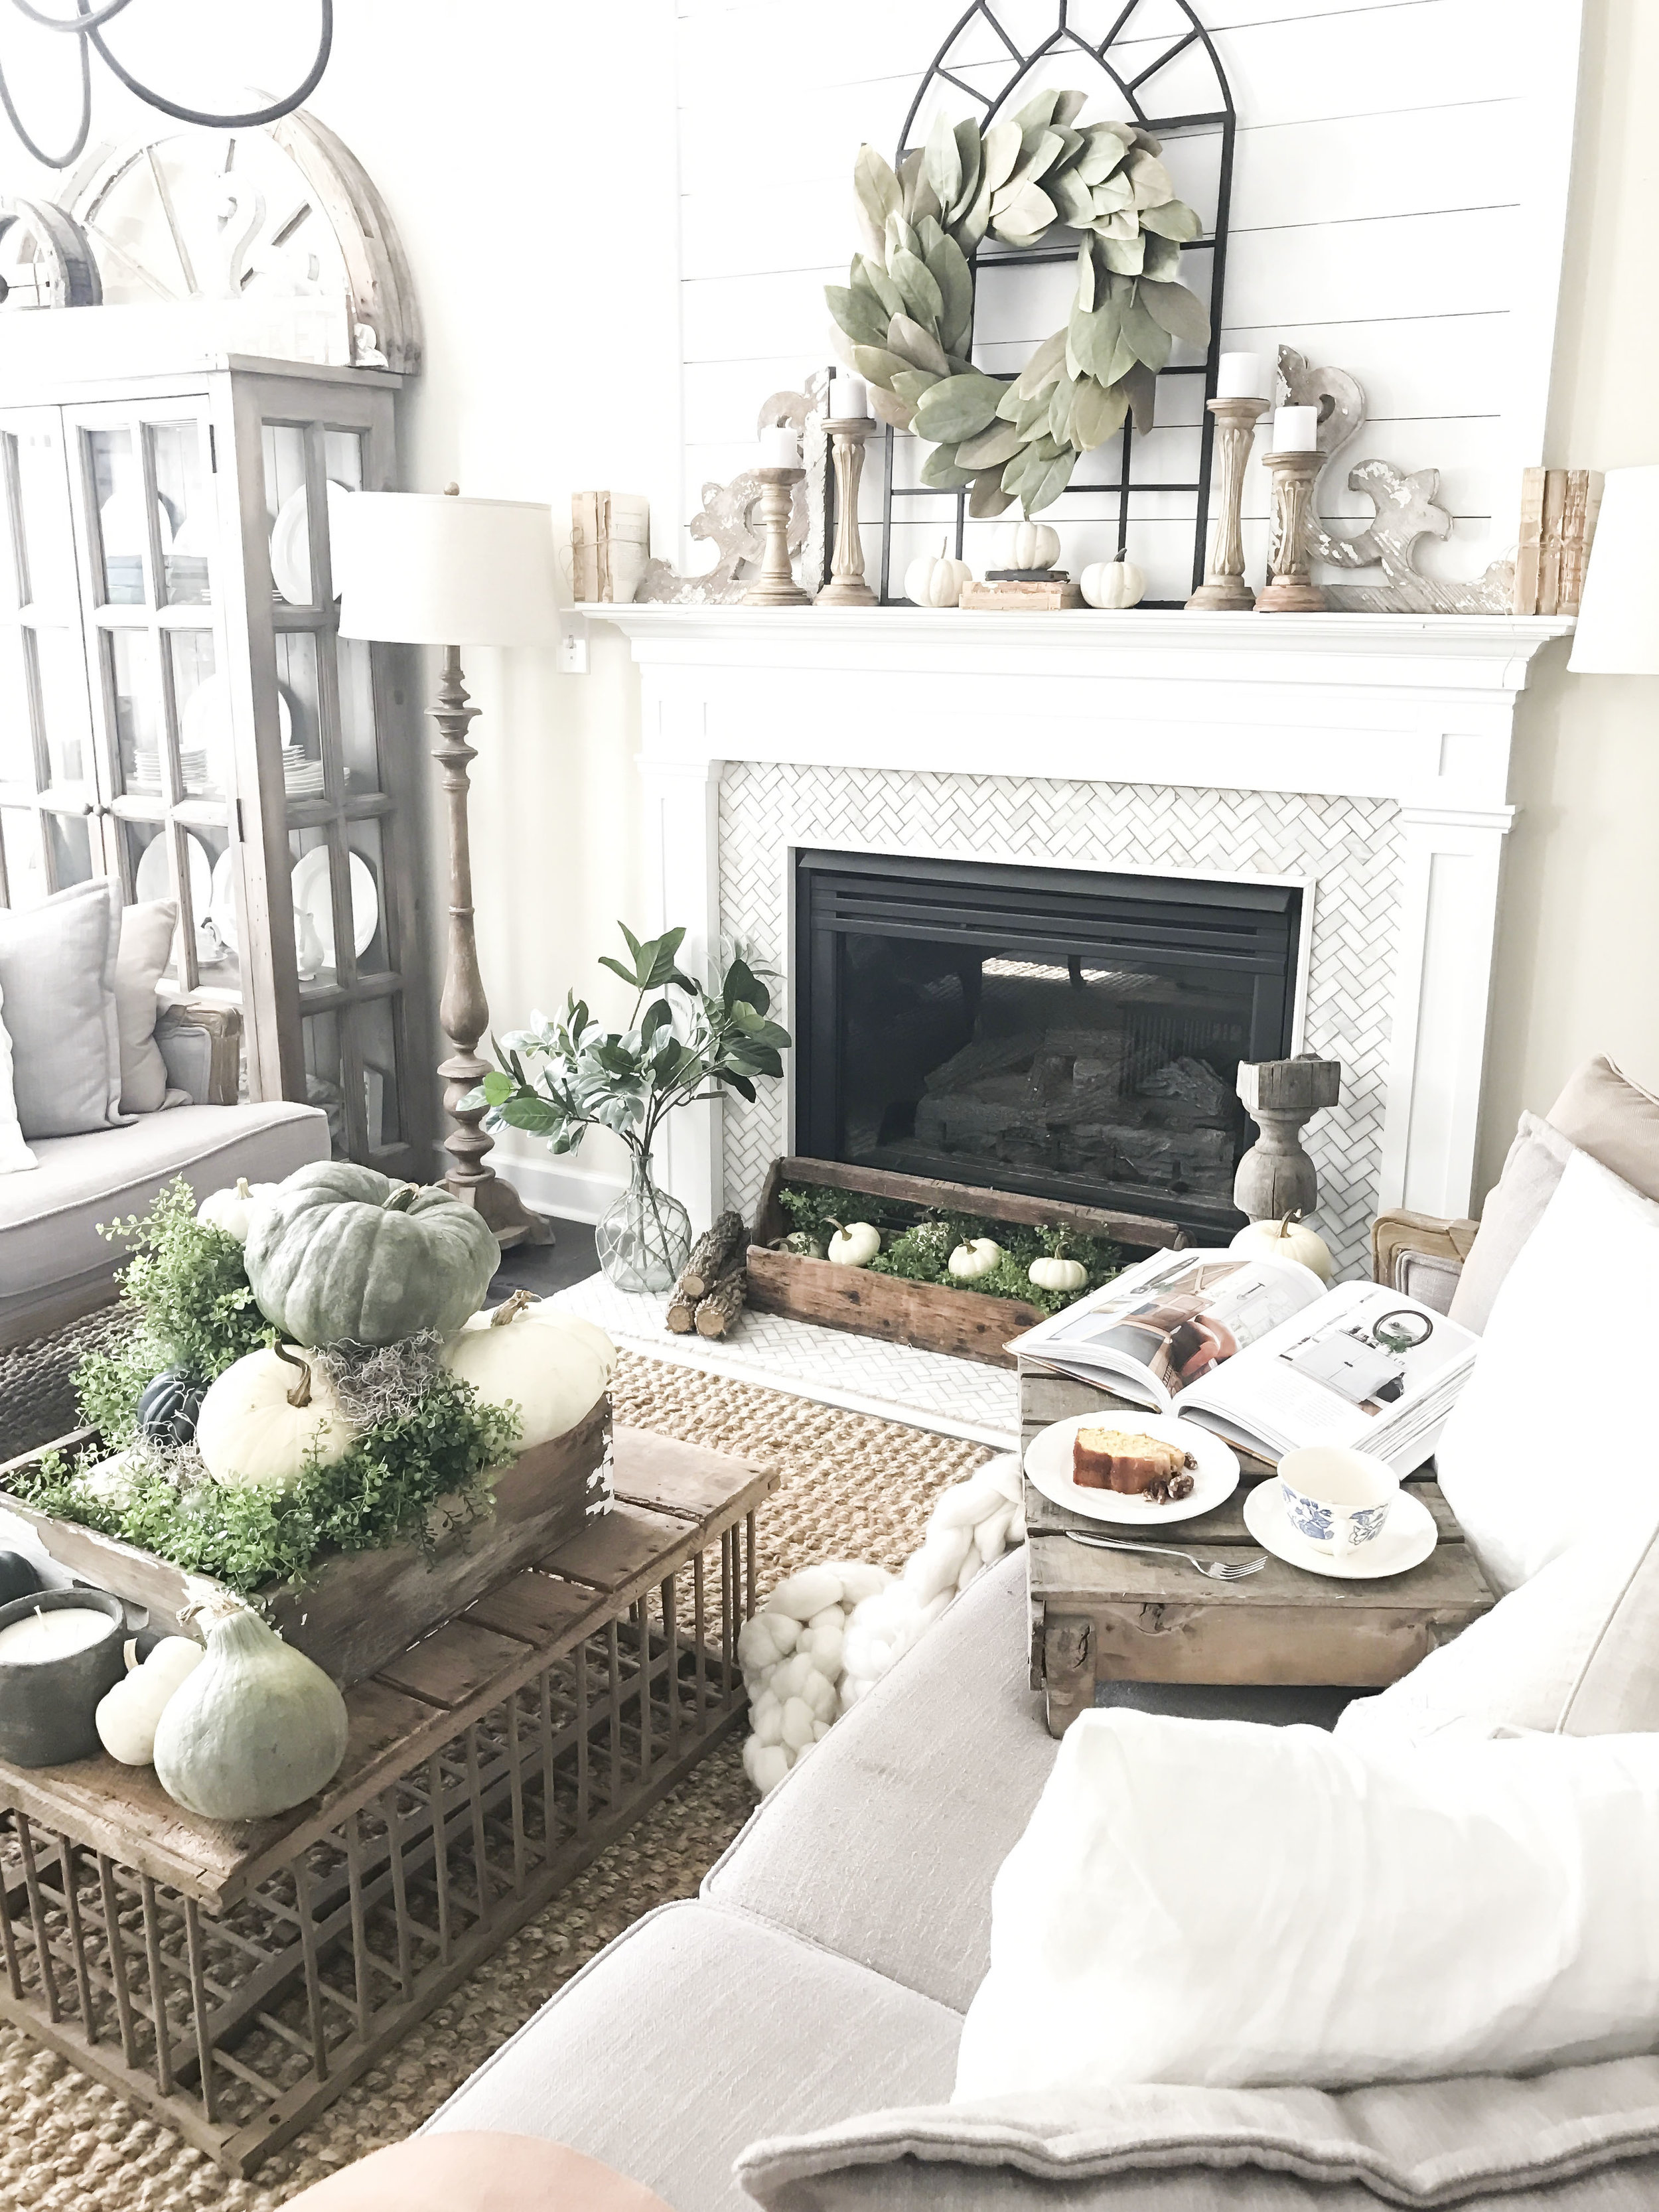 Fall Home Tour inside Plum Pretty Decor and Designs Fall Home- Living Room Neutral Fall Decor- Green, Blue and White Pumpkins